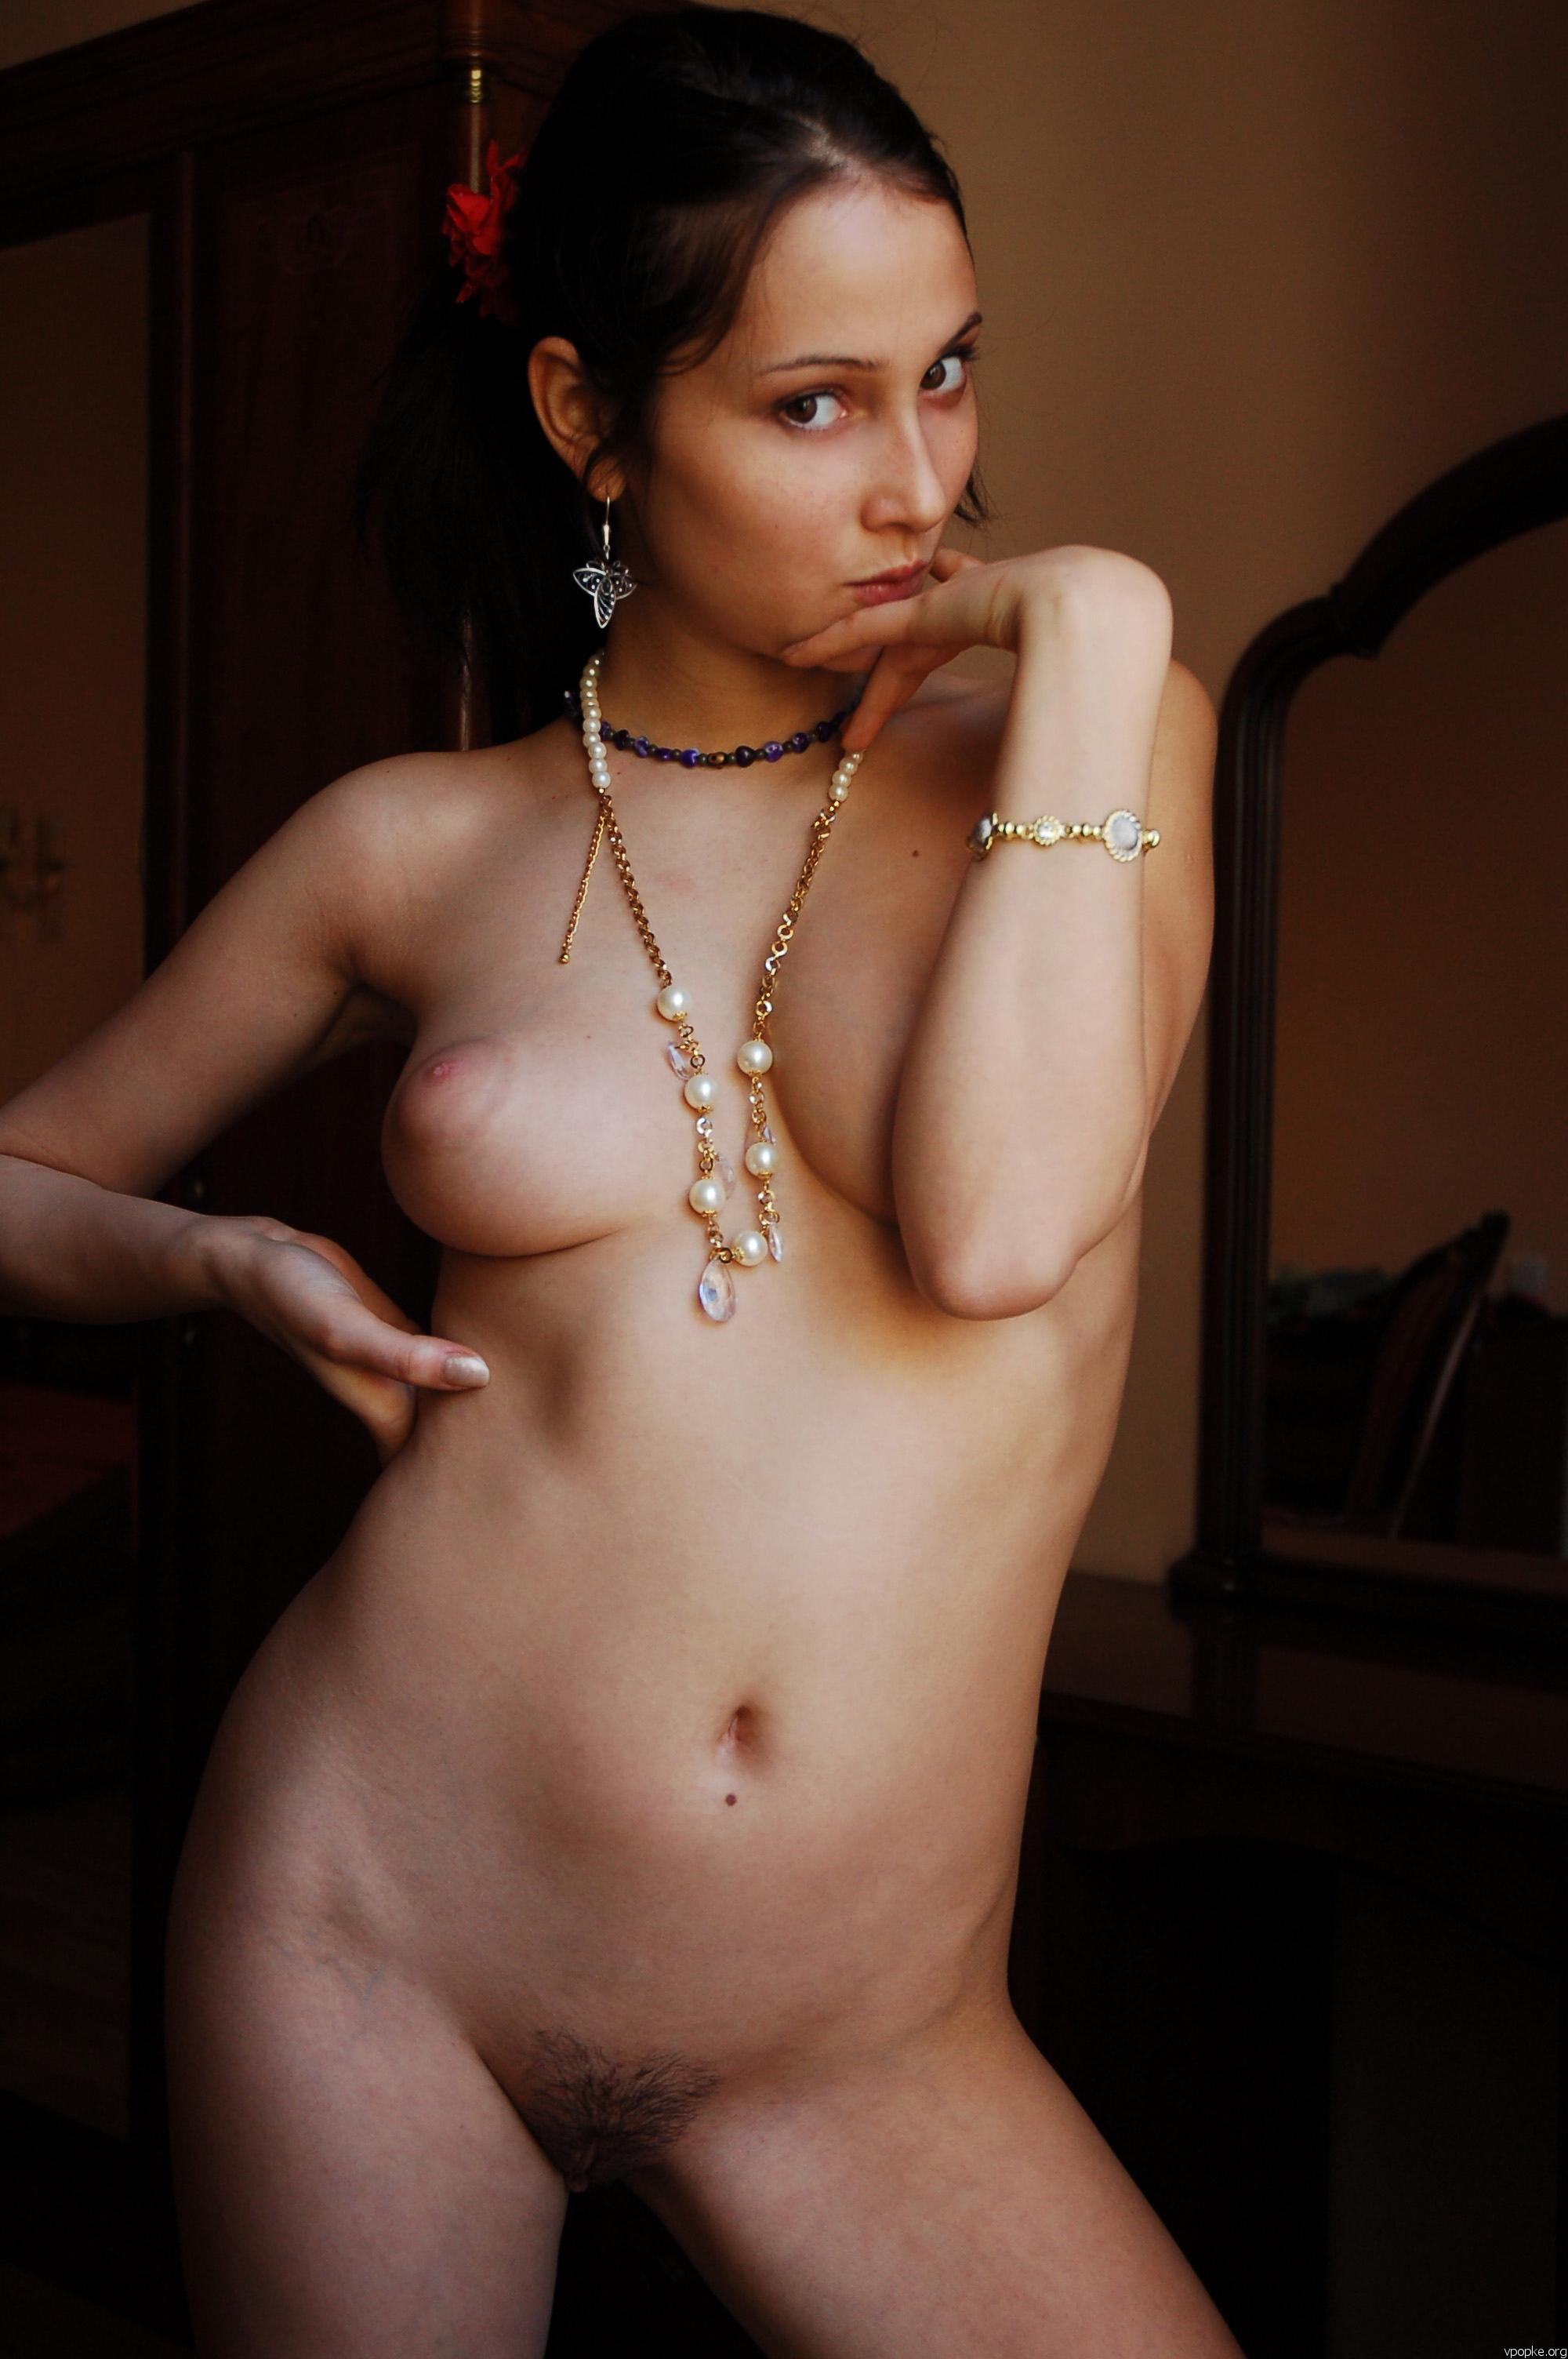 https://boobsmo.com/content/167/boobsmo_com_0000__17.jpg